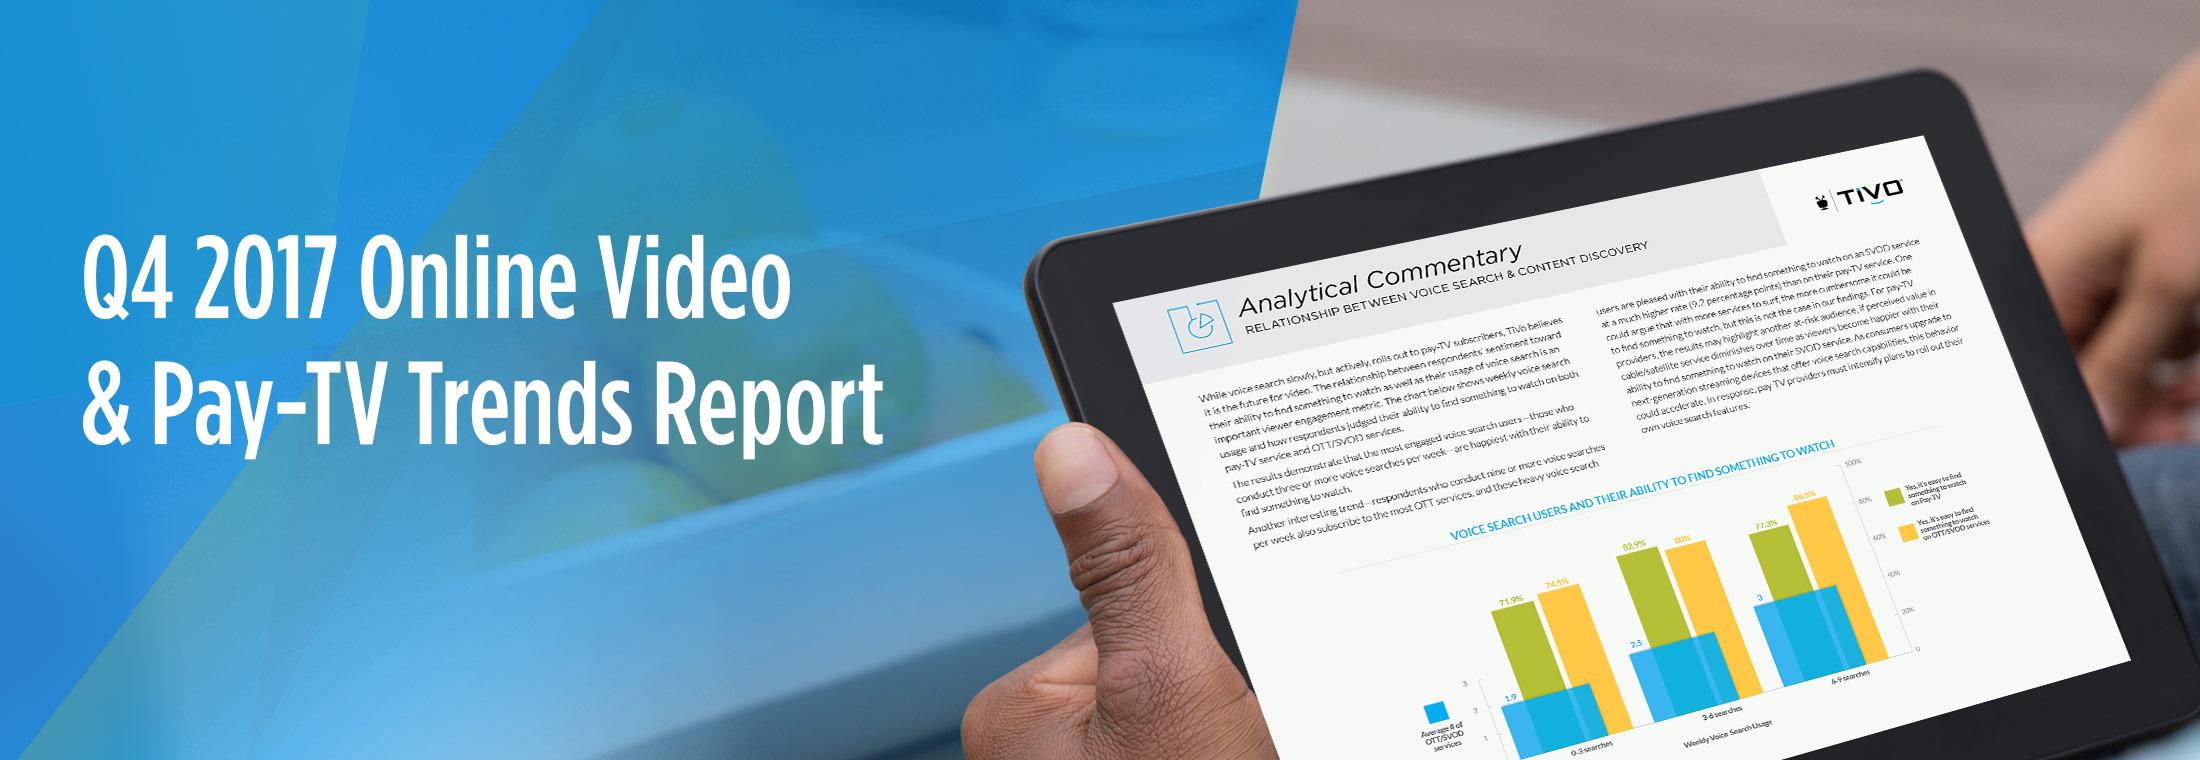 TiVo Q4 2017 Video Trends Report